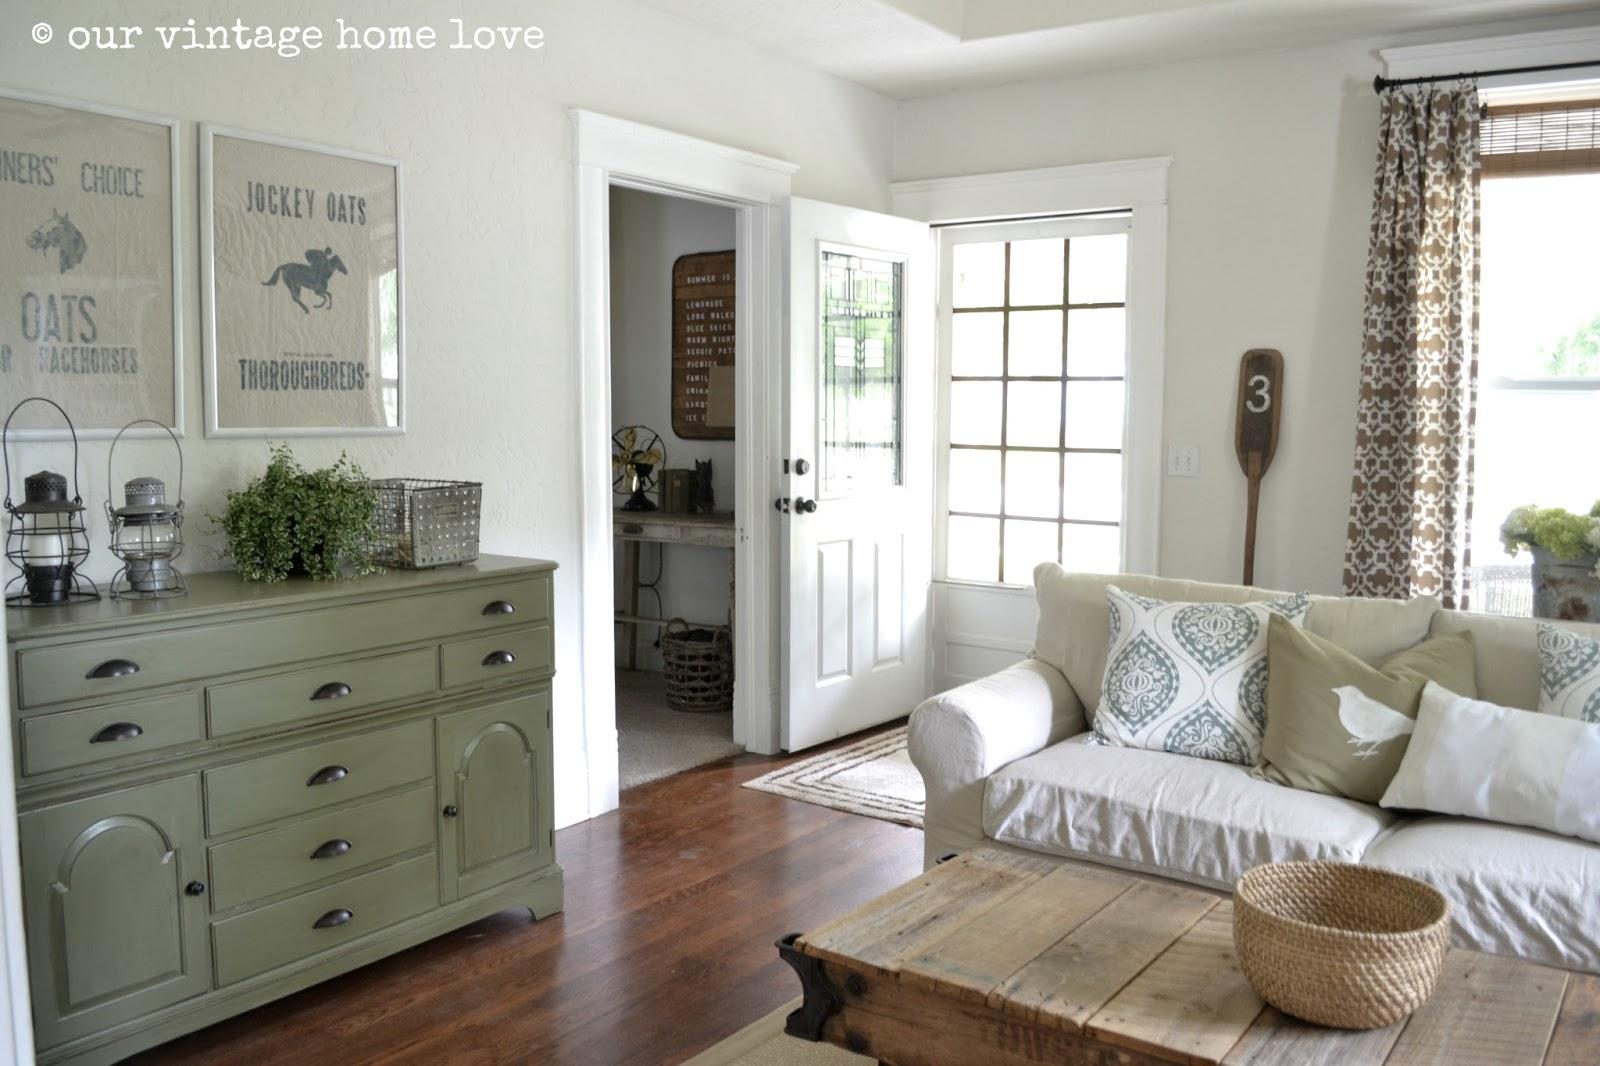 Surprising Vintage Home Decor Malaysia Ideas - Simple Design Home ...